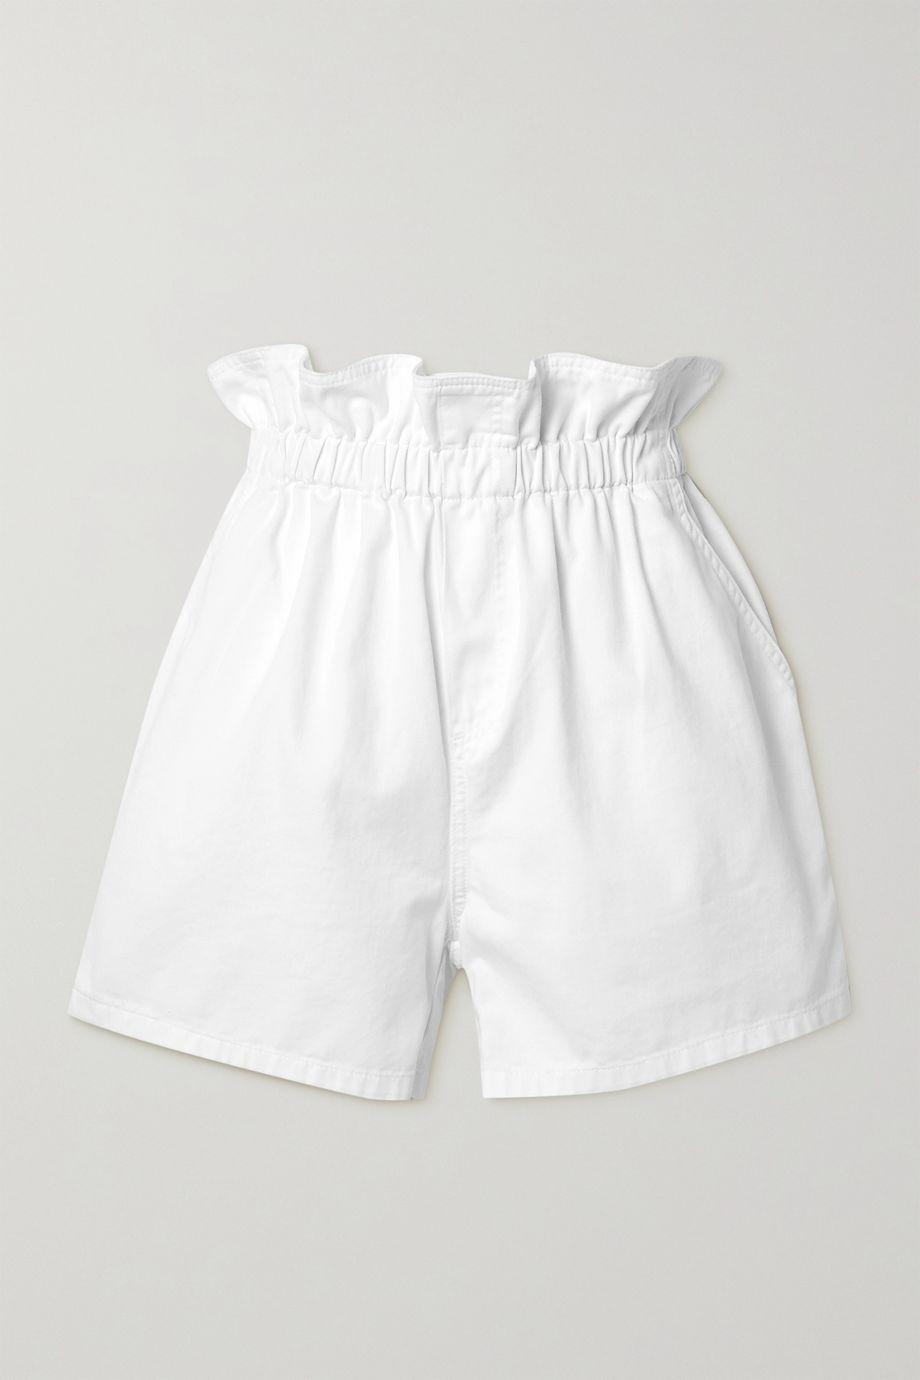 Philosophy di Lorenzo Serafini Cotton-twill shorts